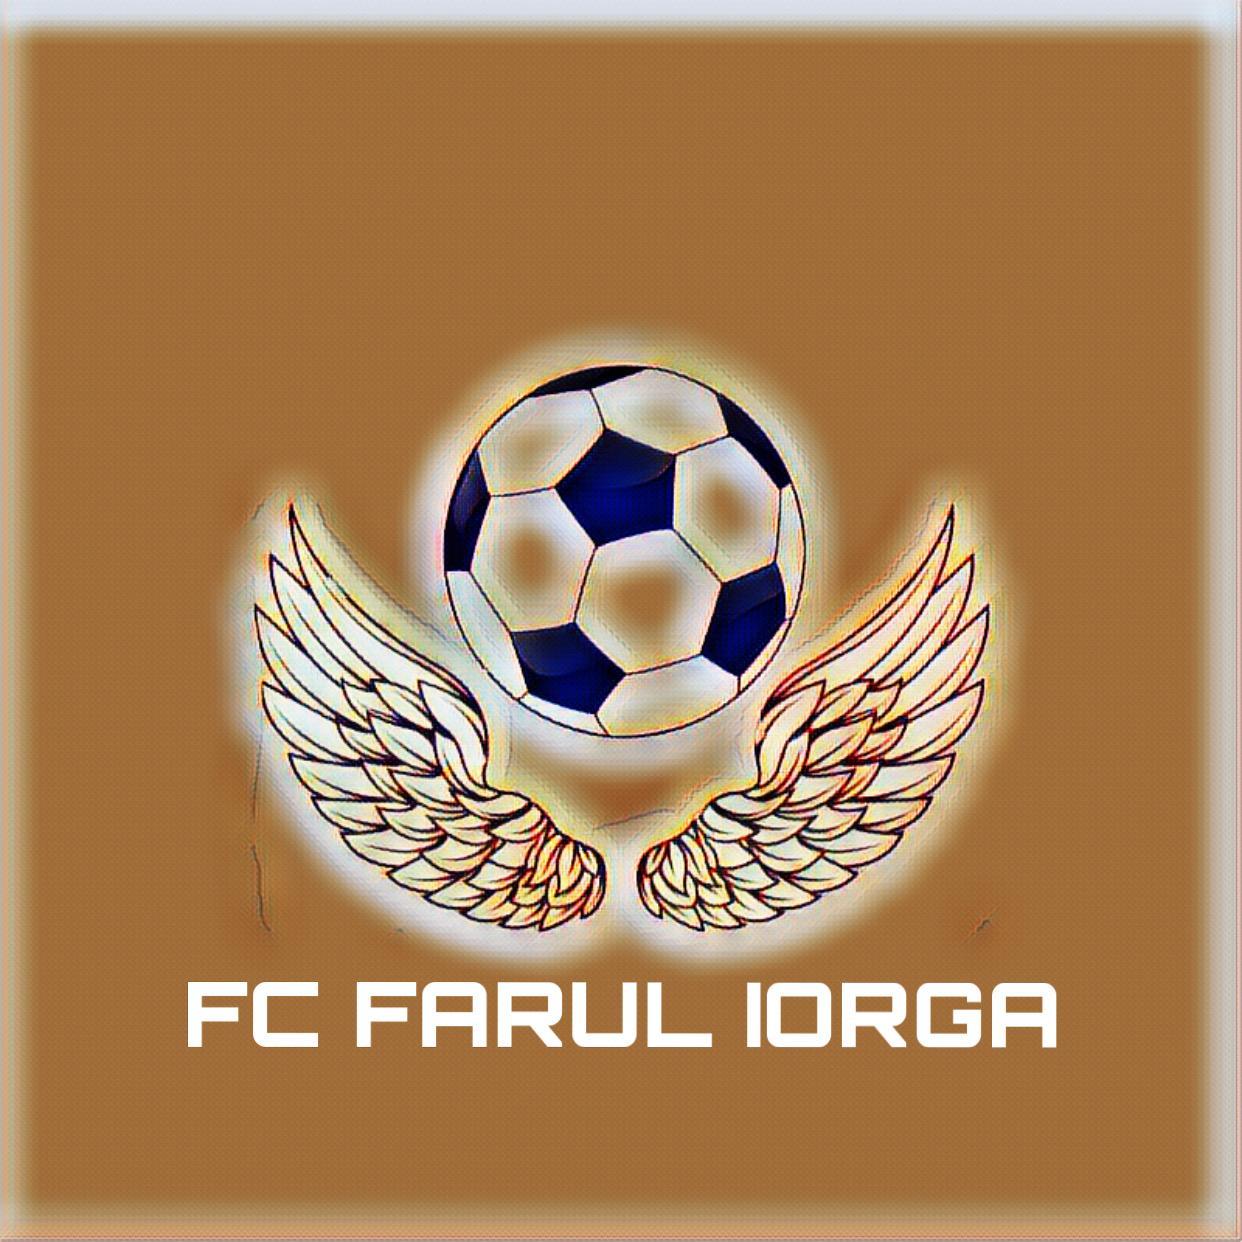 FC Farul Iorga